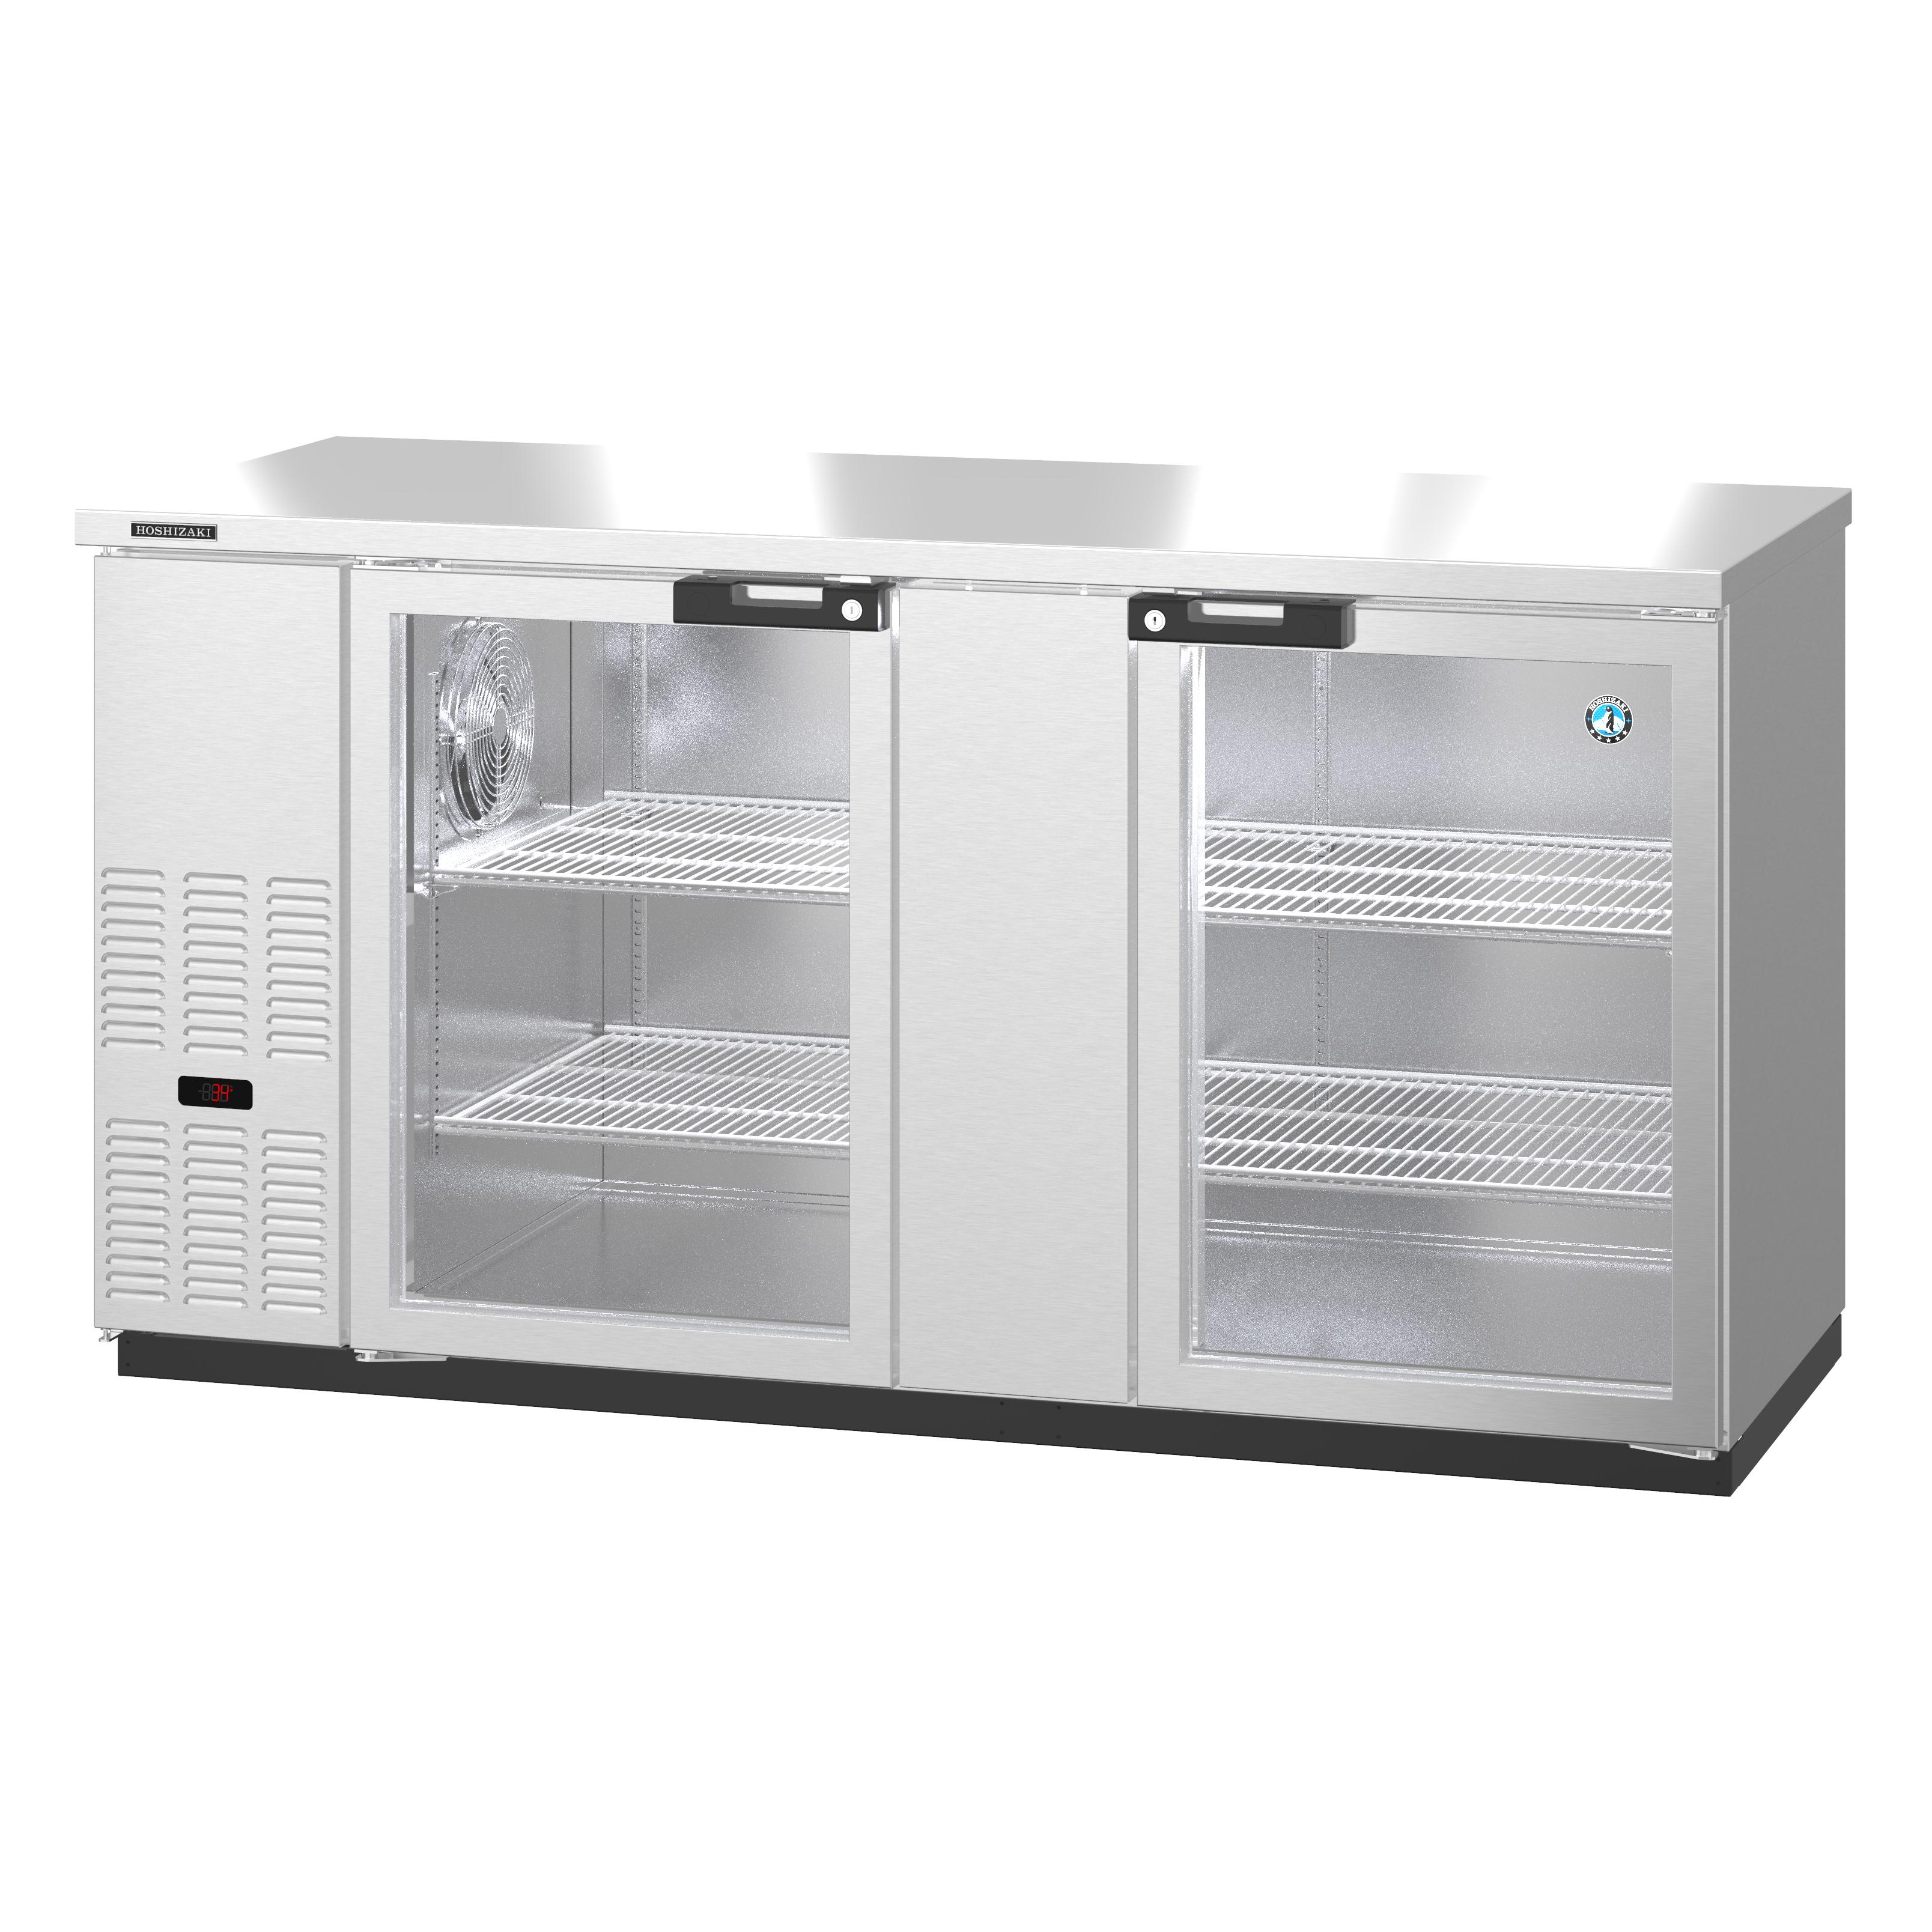 Hoshizaki HBB-3G-LD-69-S underbar equipment/refrigeration